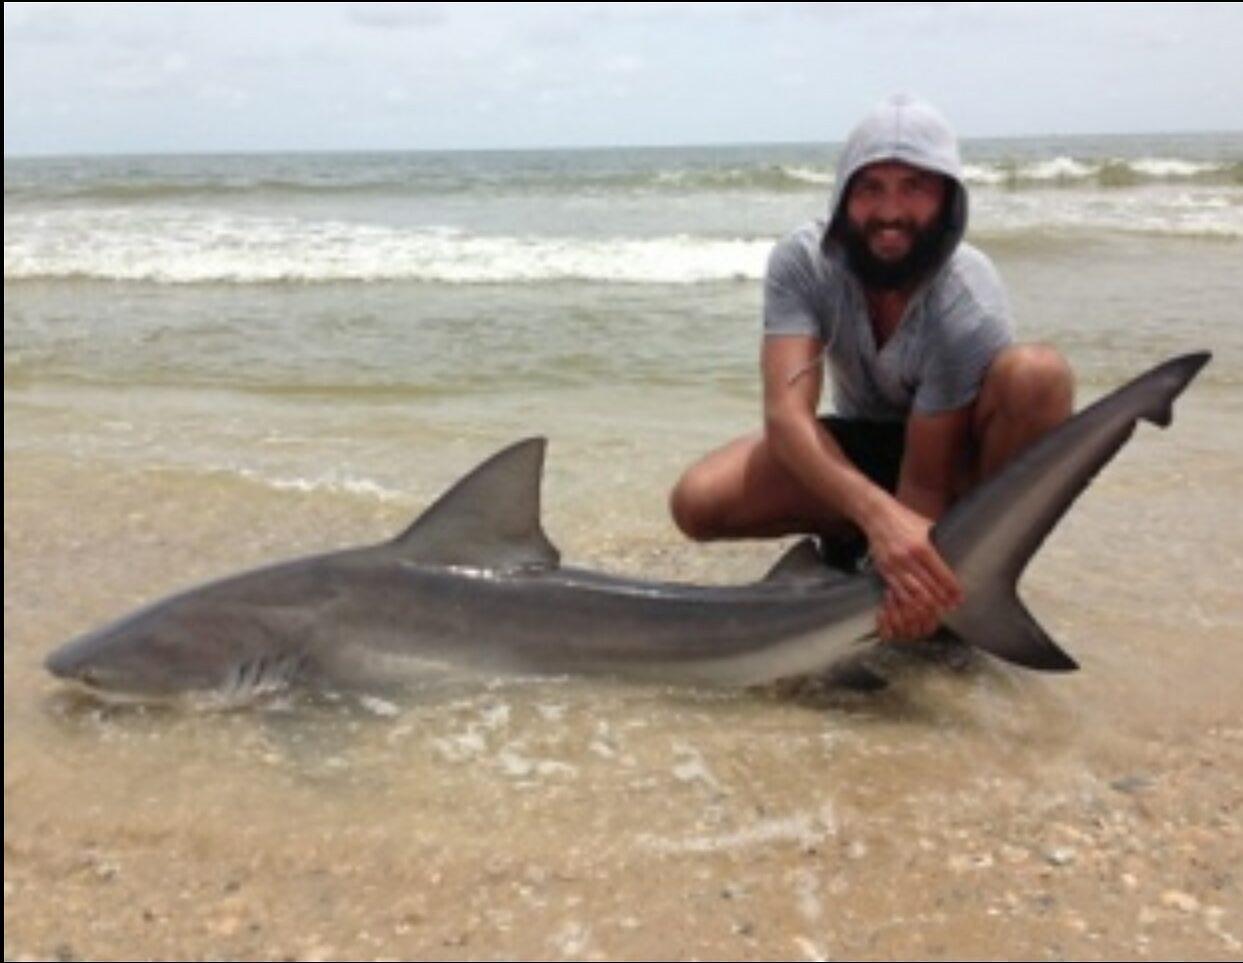 Bull shark caught from the beach